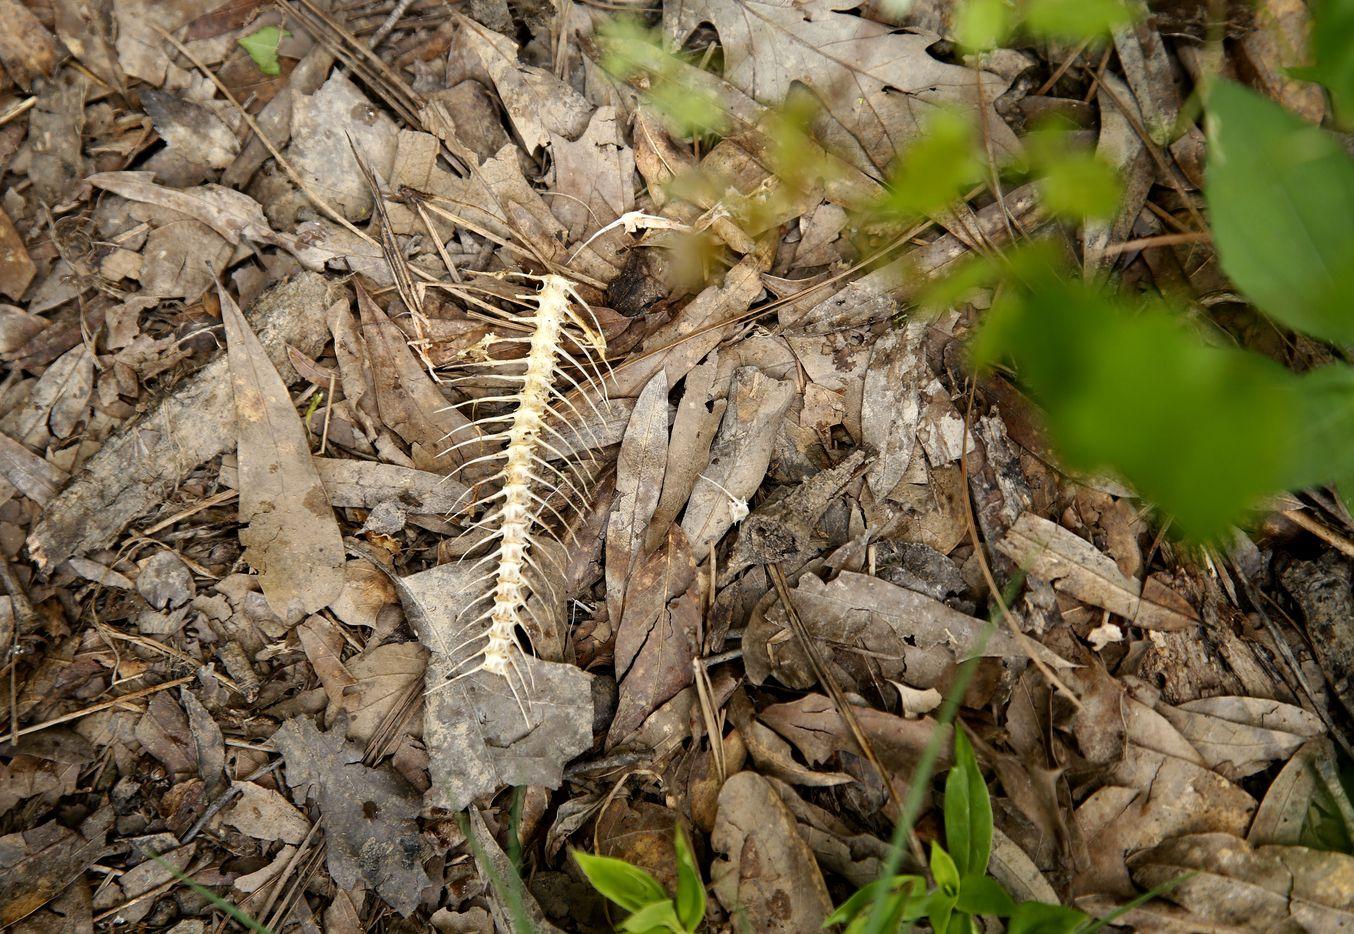 Fish bones lie near the lake shore in Caddo Lake National Wildlife Refuge in Karnack, Texas Tuesday June 19, 2018.